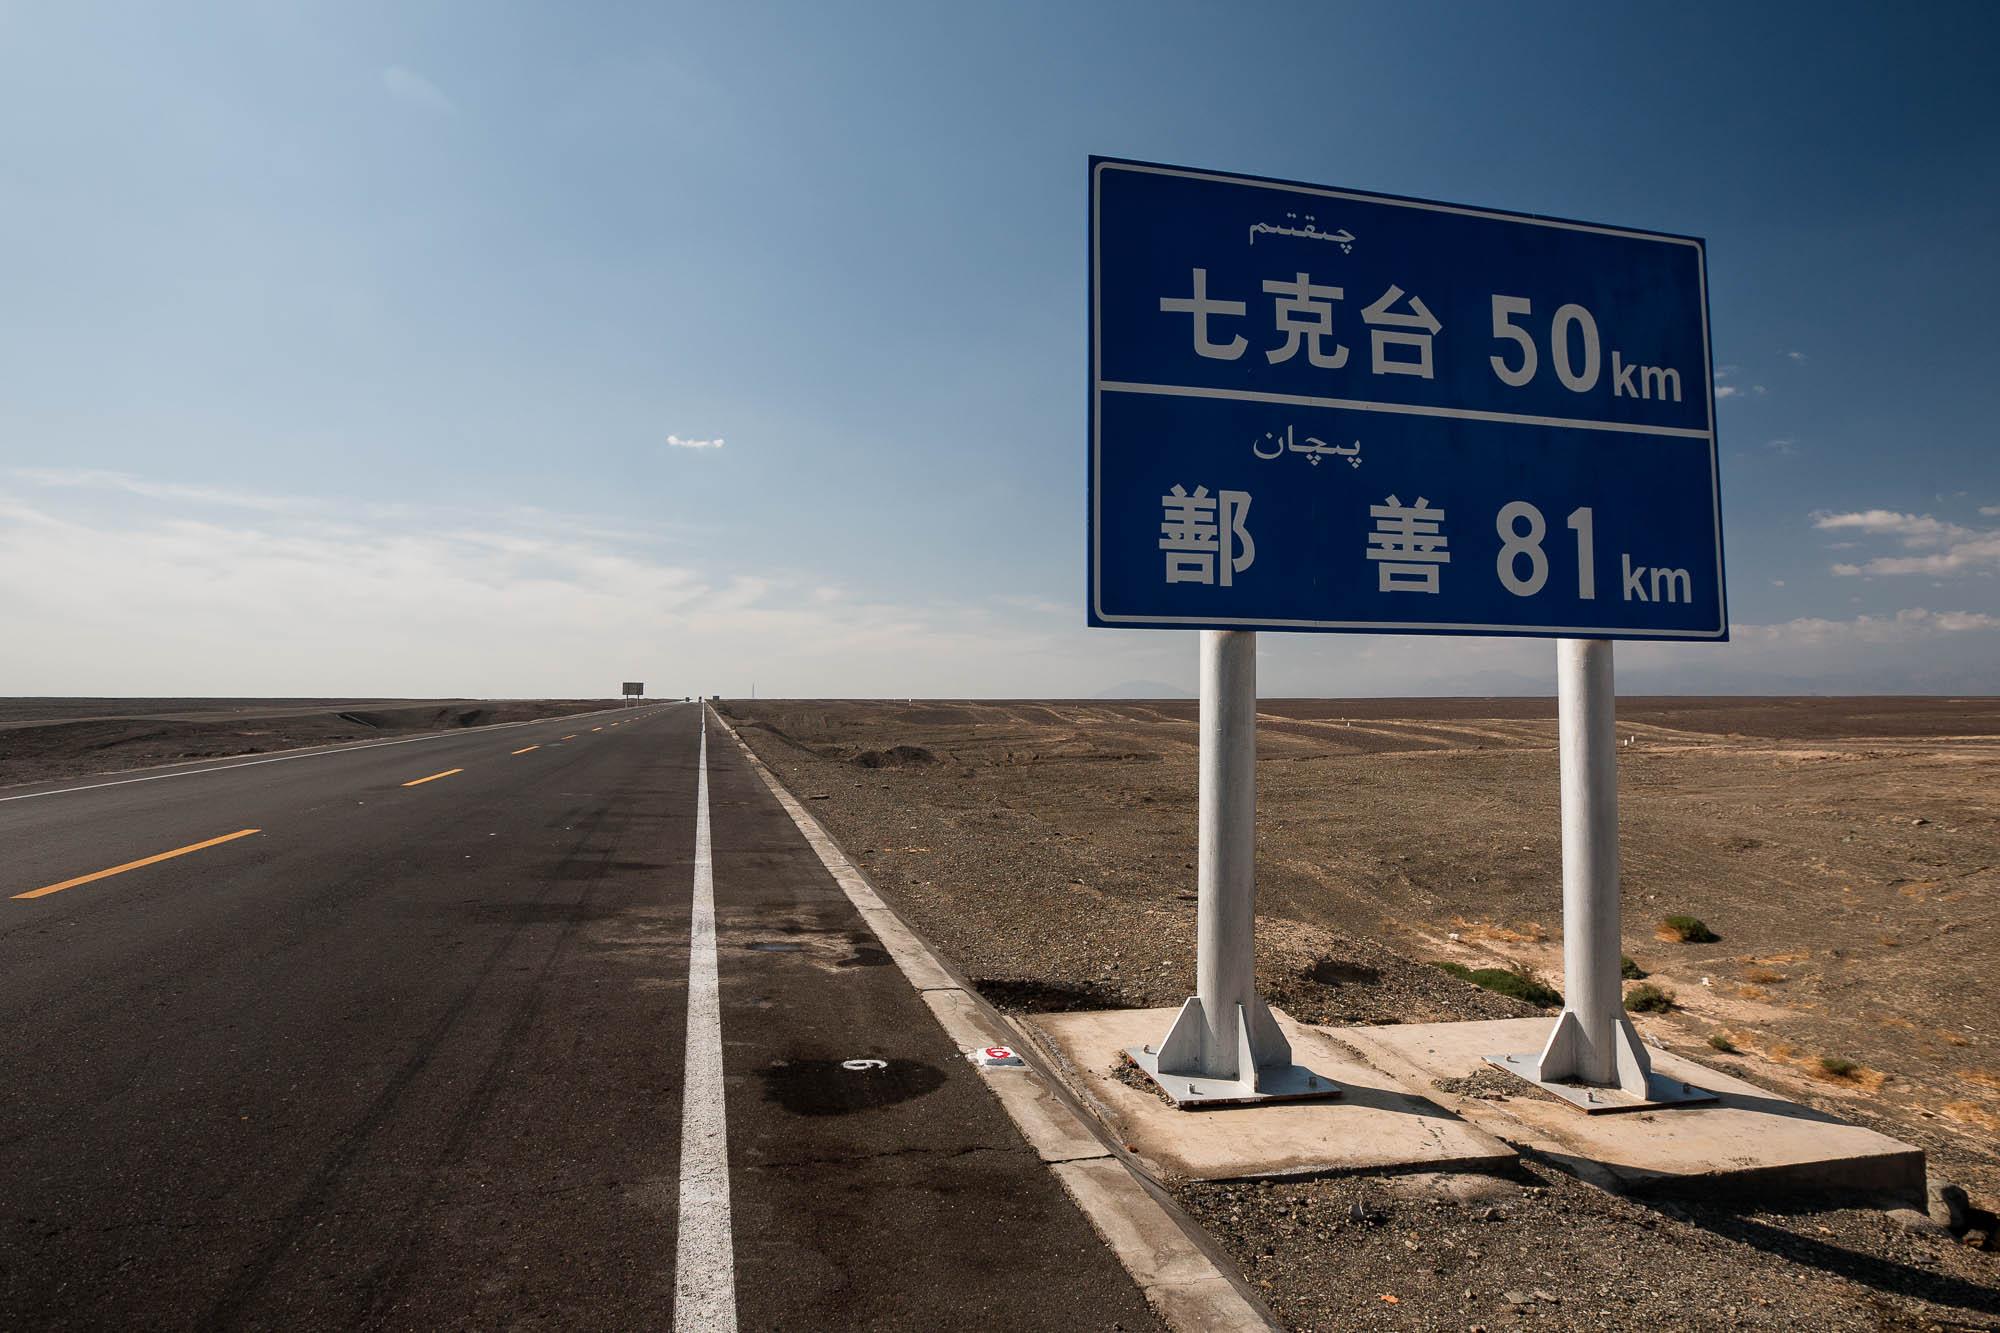 81km to Shanshan